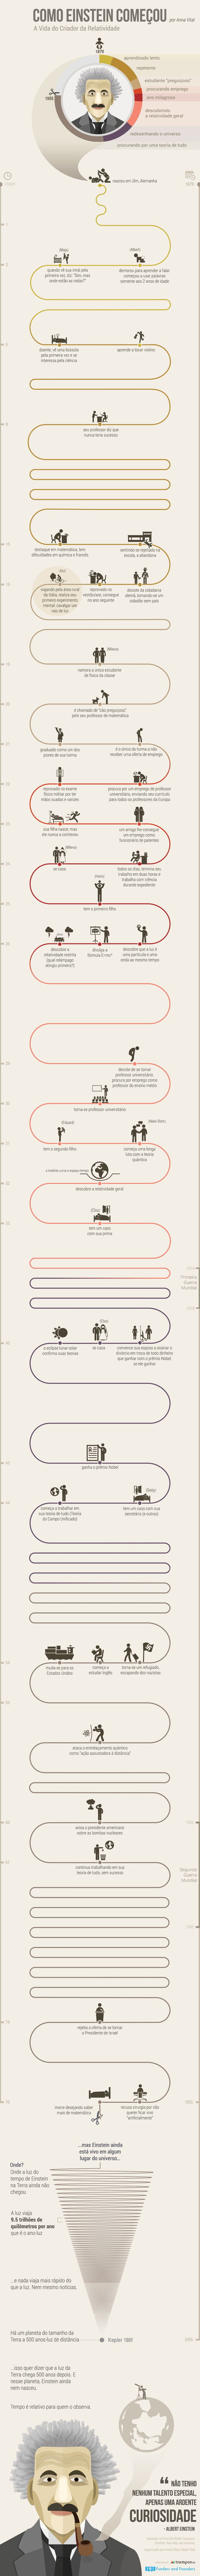 Infográfico: como Einstein começou.